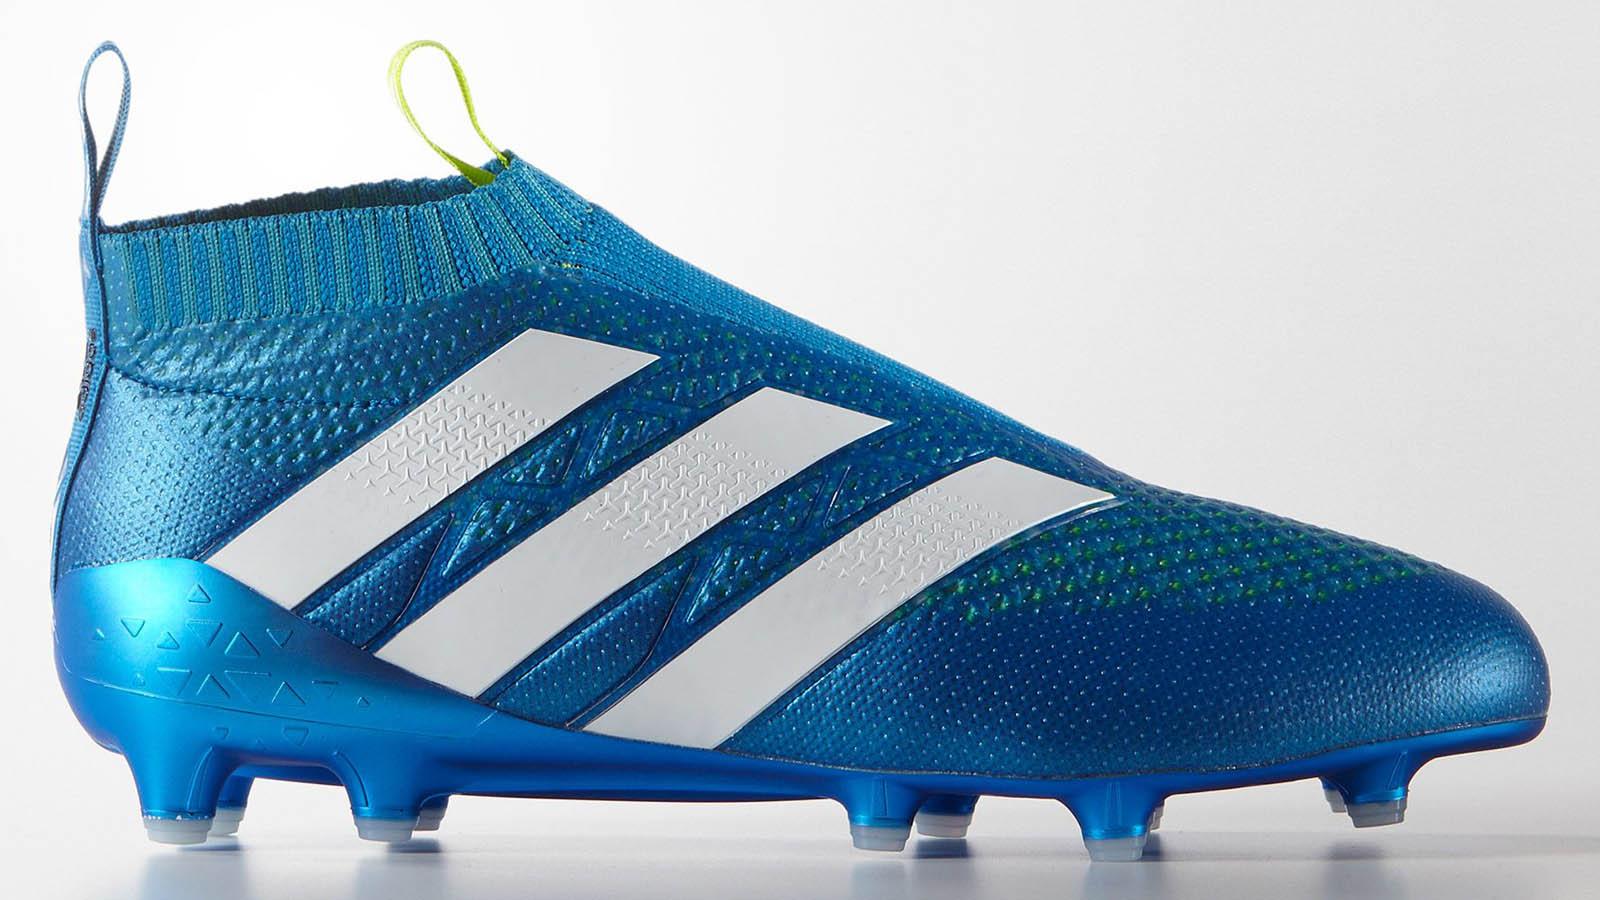 de0463274189ac amazon blau adidas ace boots 2ccb0 24e31